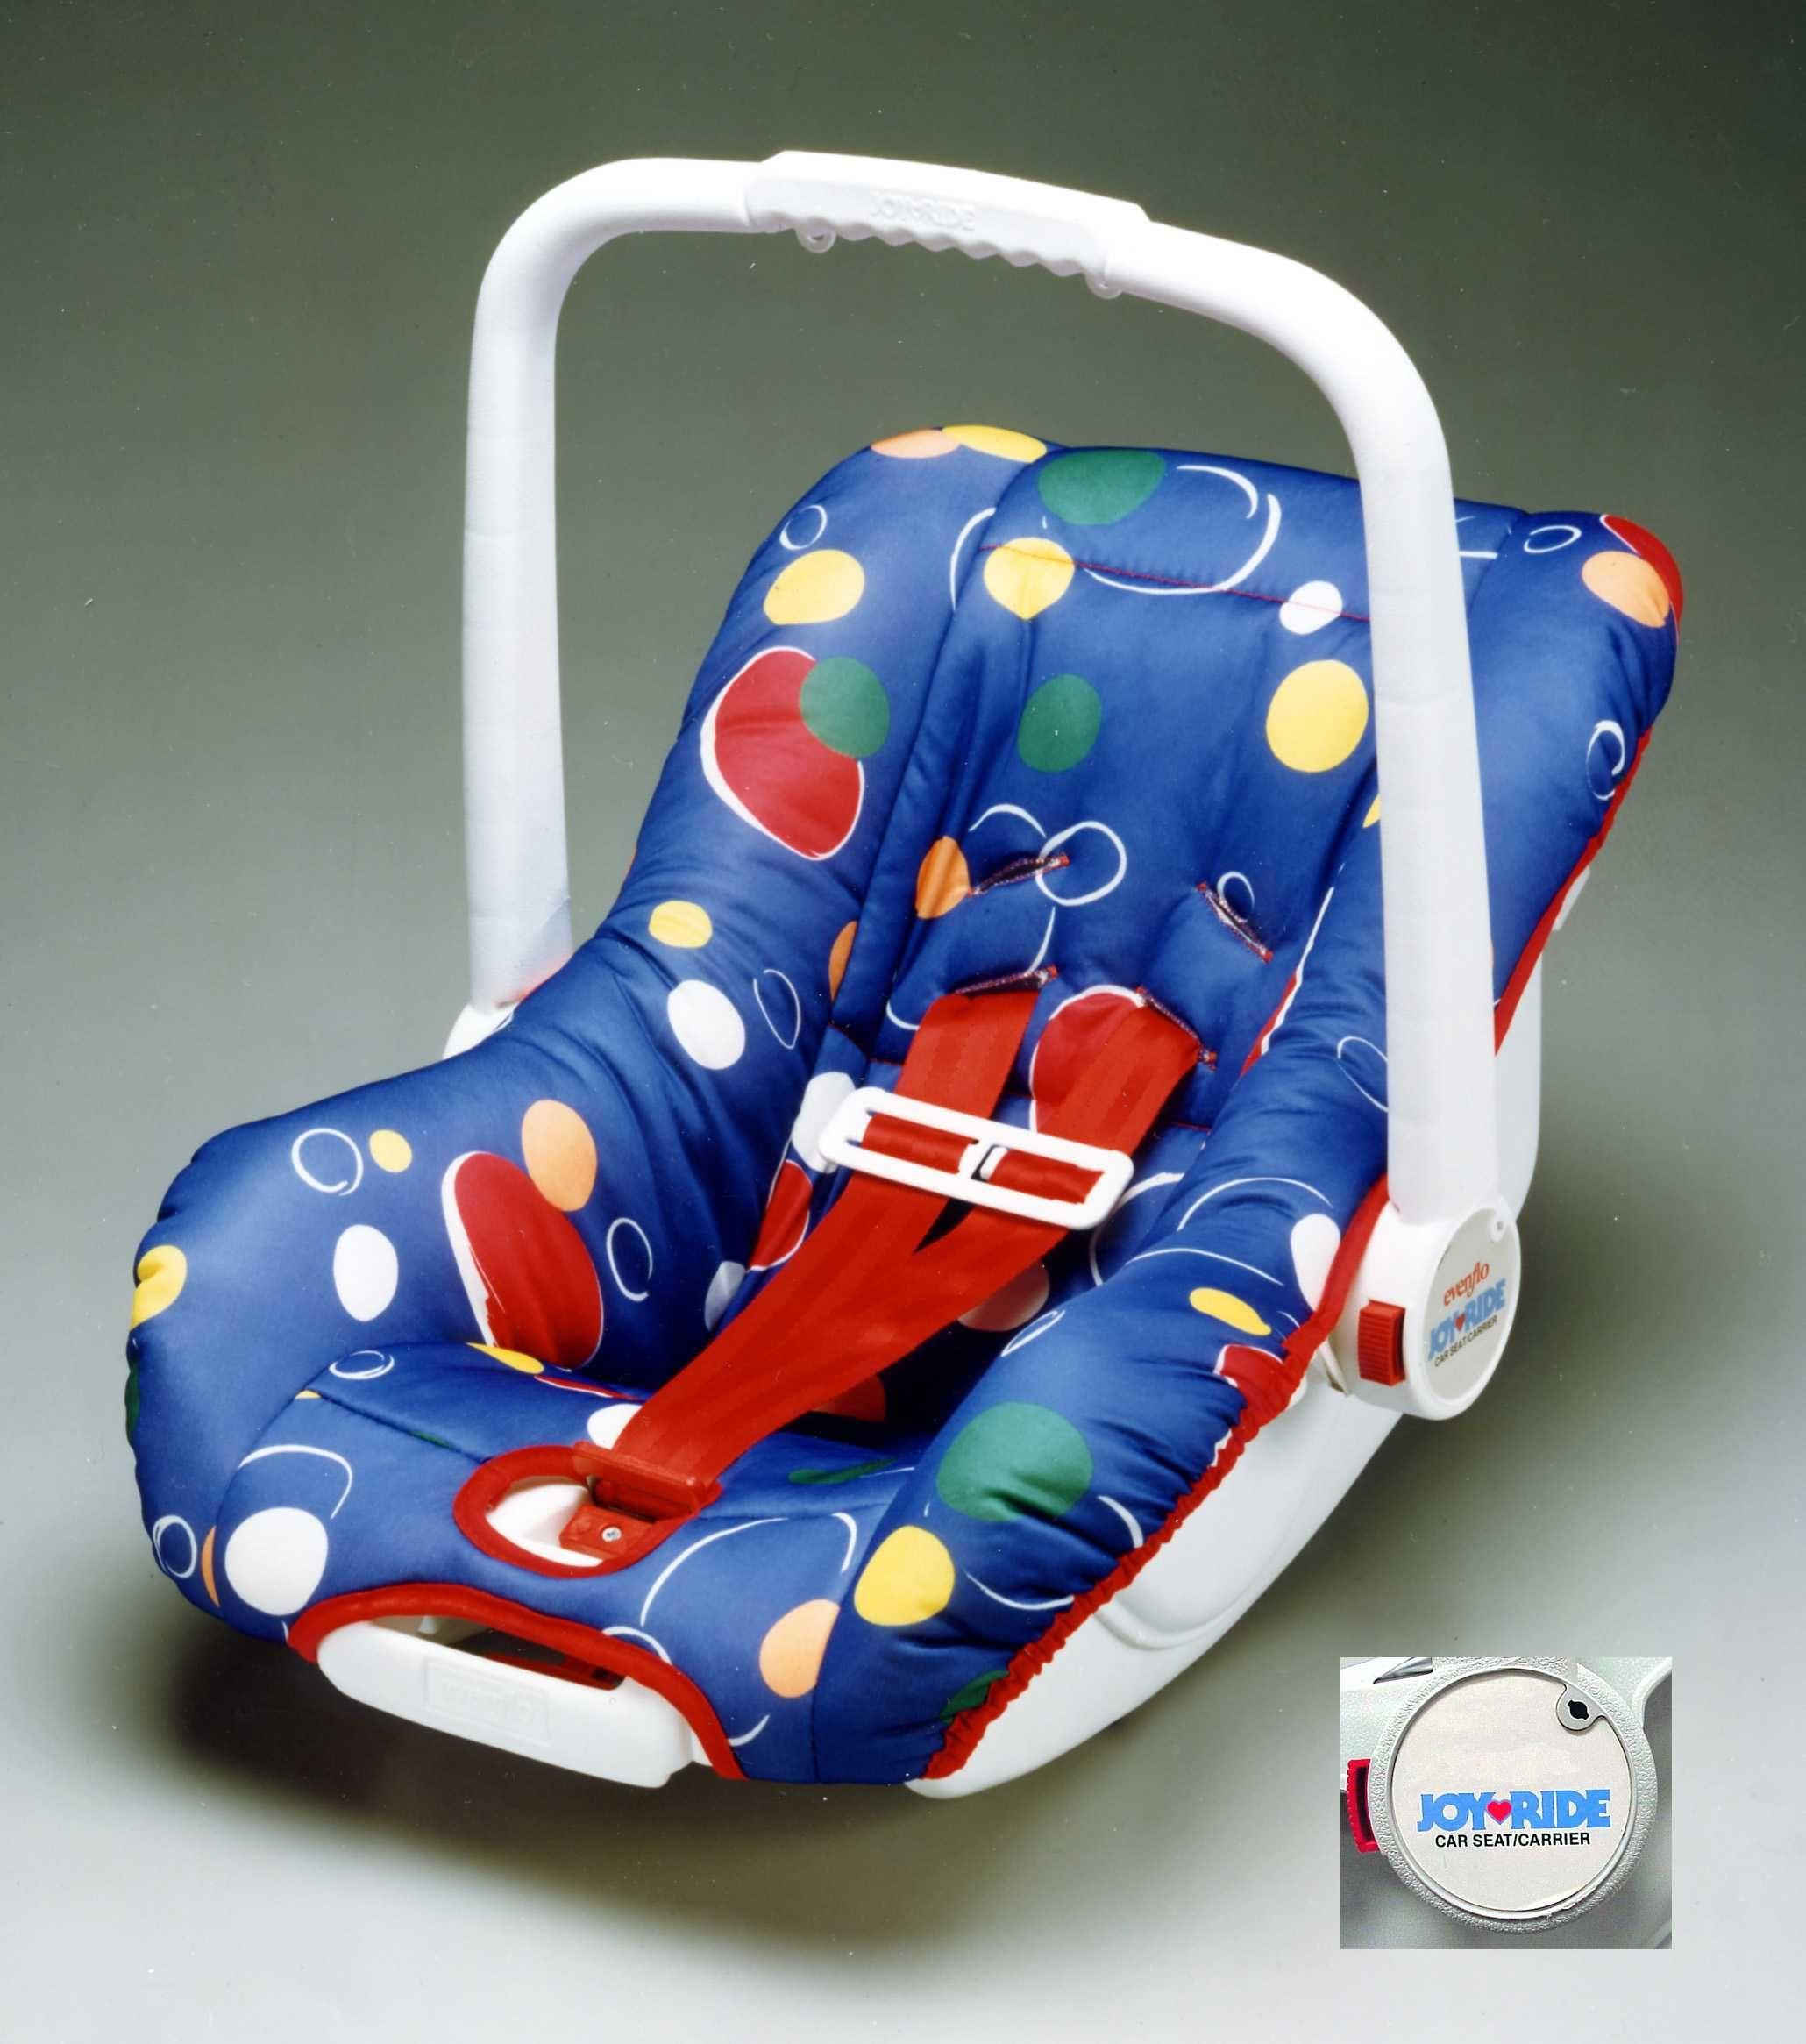 Evenflo Joyride Car Seats no base mid to late 90s  Baby